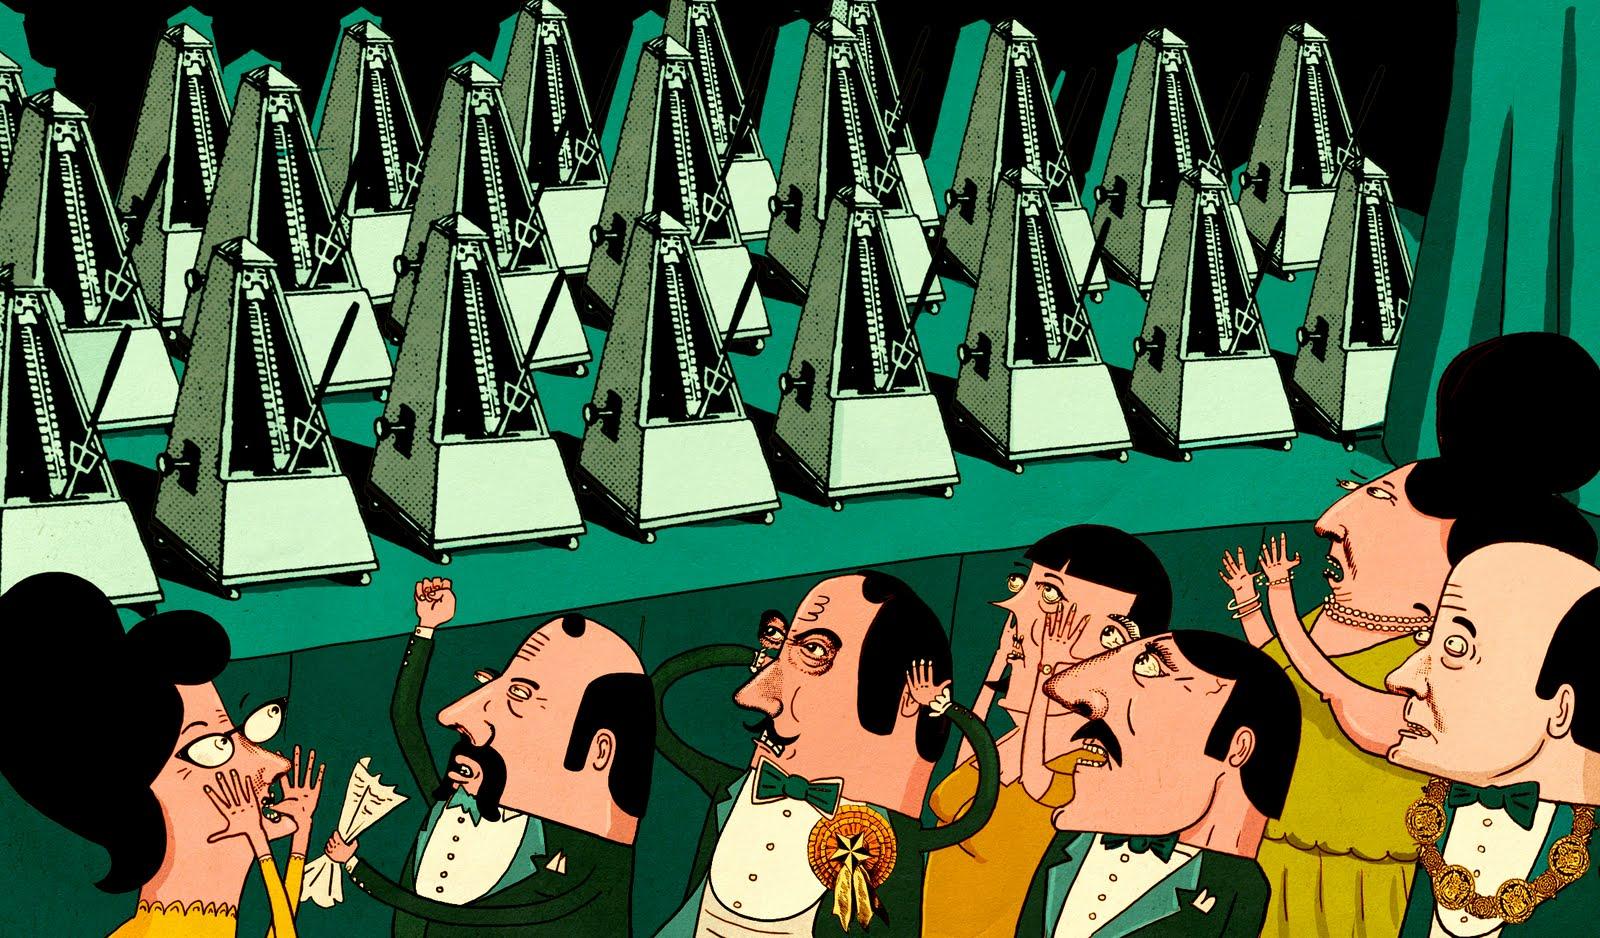 Gyorgi Ligeti – Poeme Symphonique For 100 Metronomes